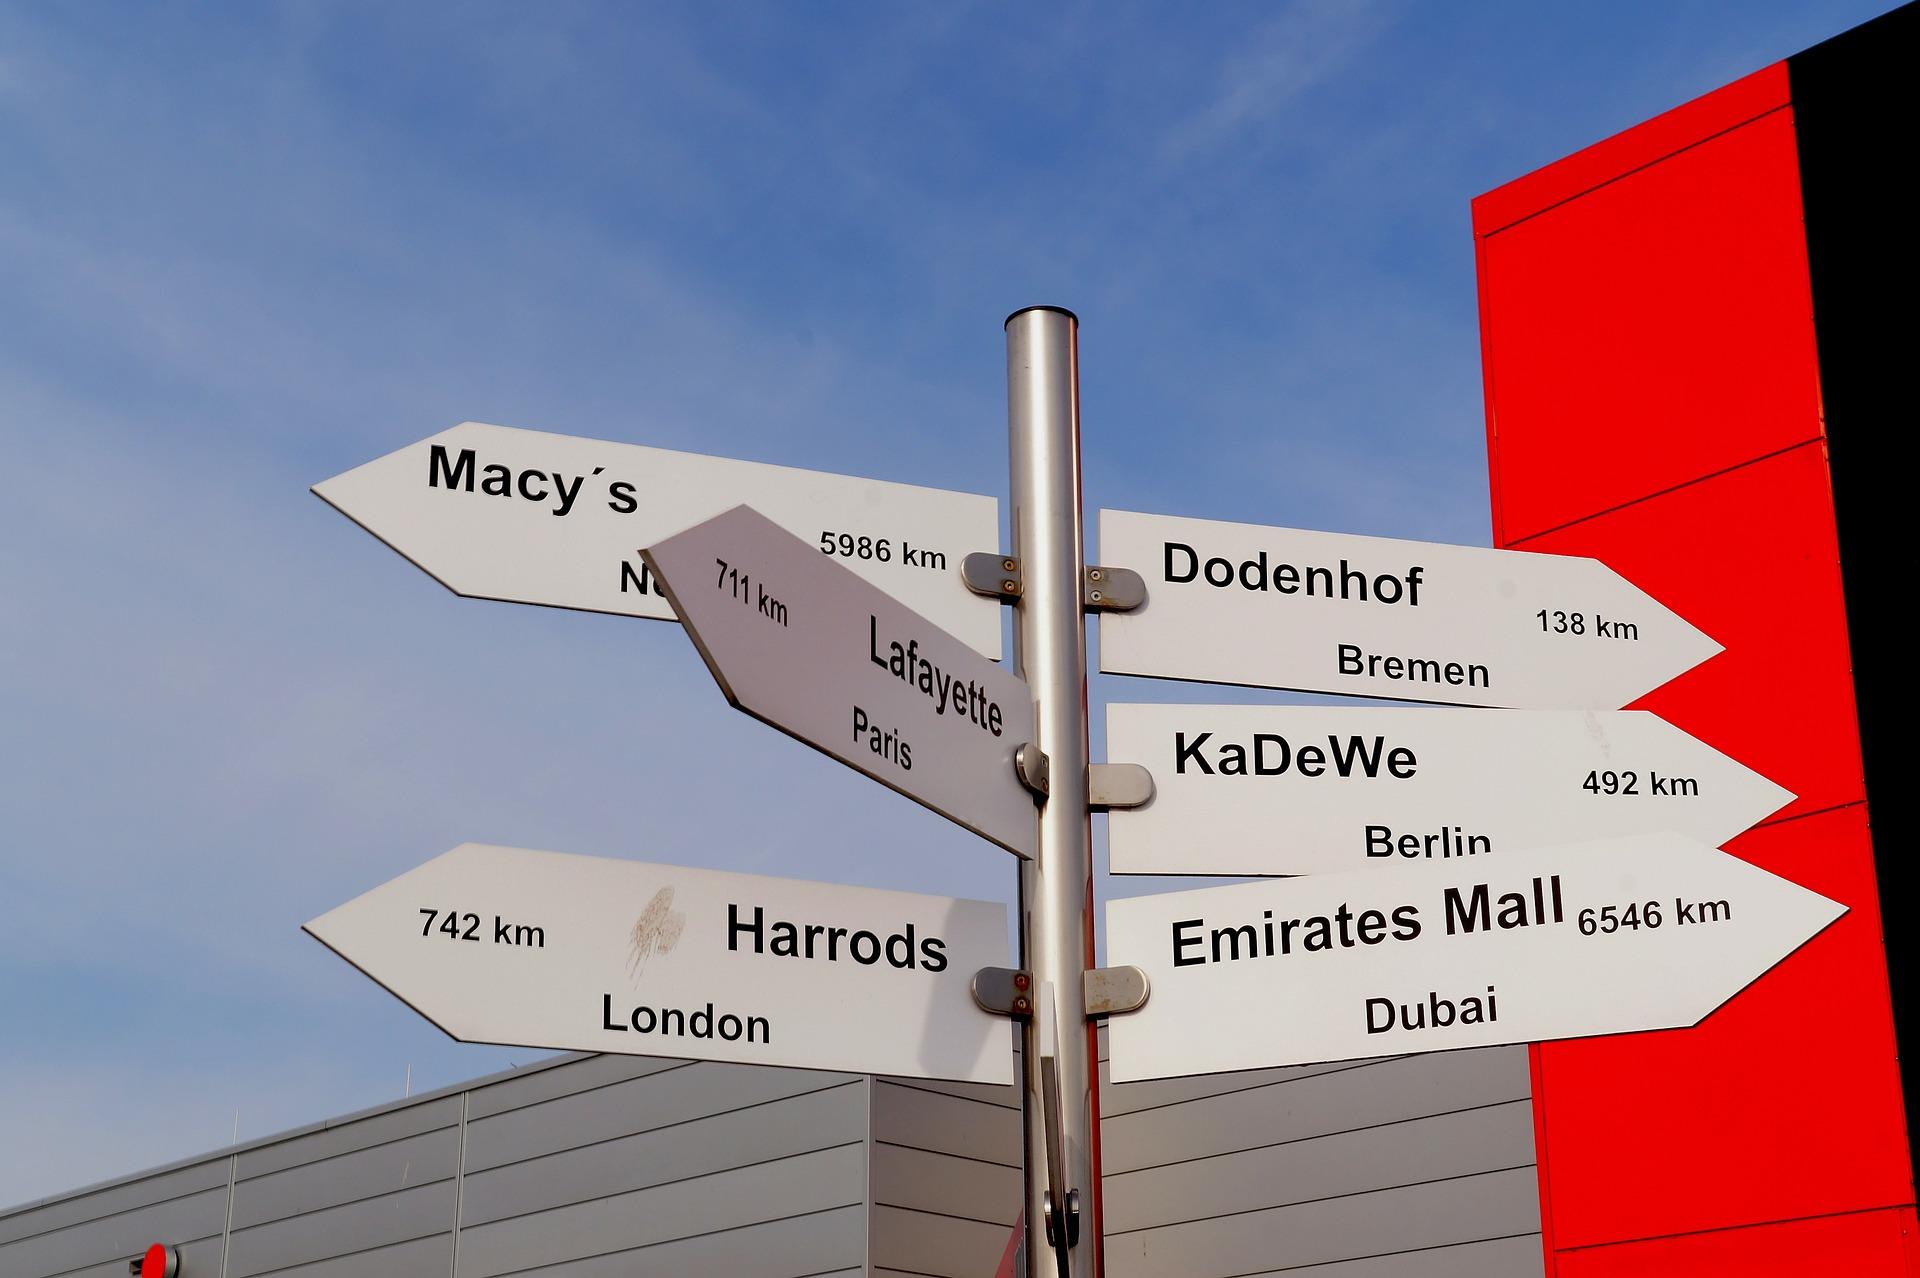 street sign showing Macy's, KaDeWe, Harrods, Emirates Mall